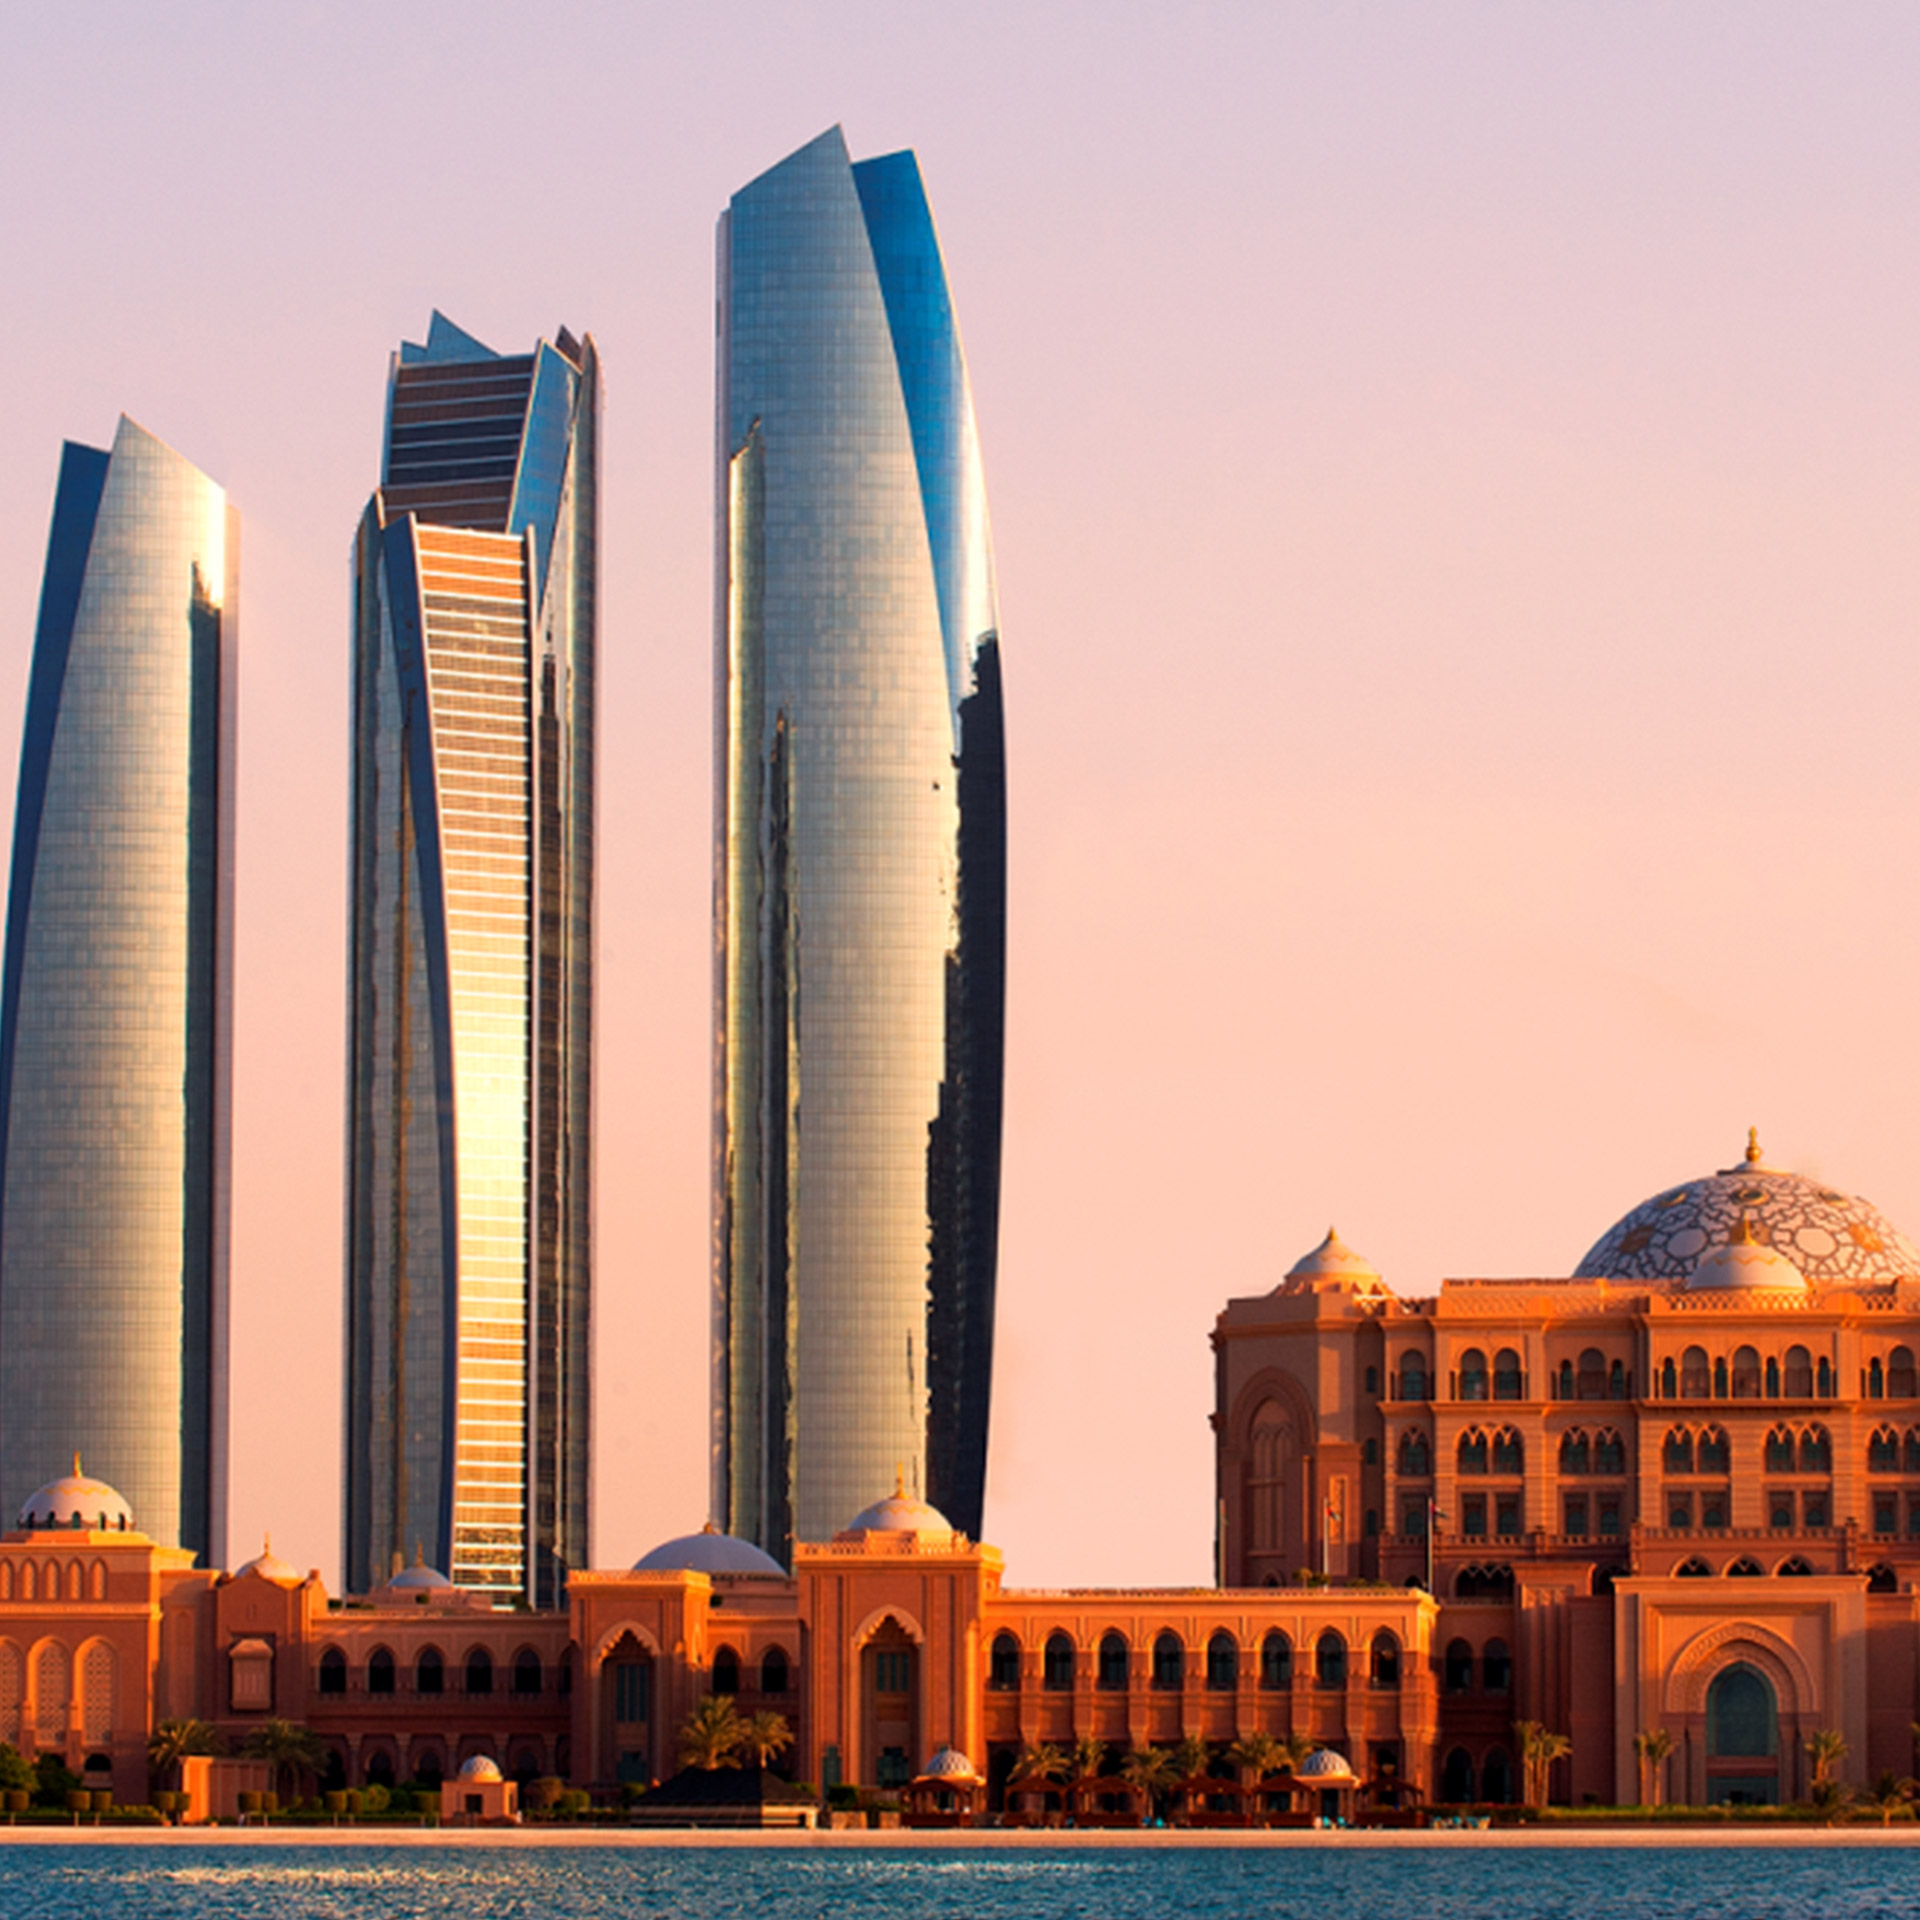 Dubai e abu dhabi soggiorno mare gastaldi holidays - Abu dhabi luoghi di interesse ...